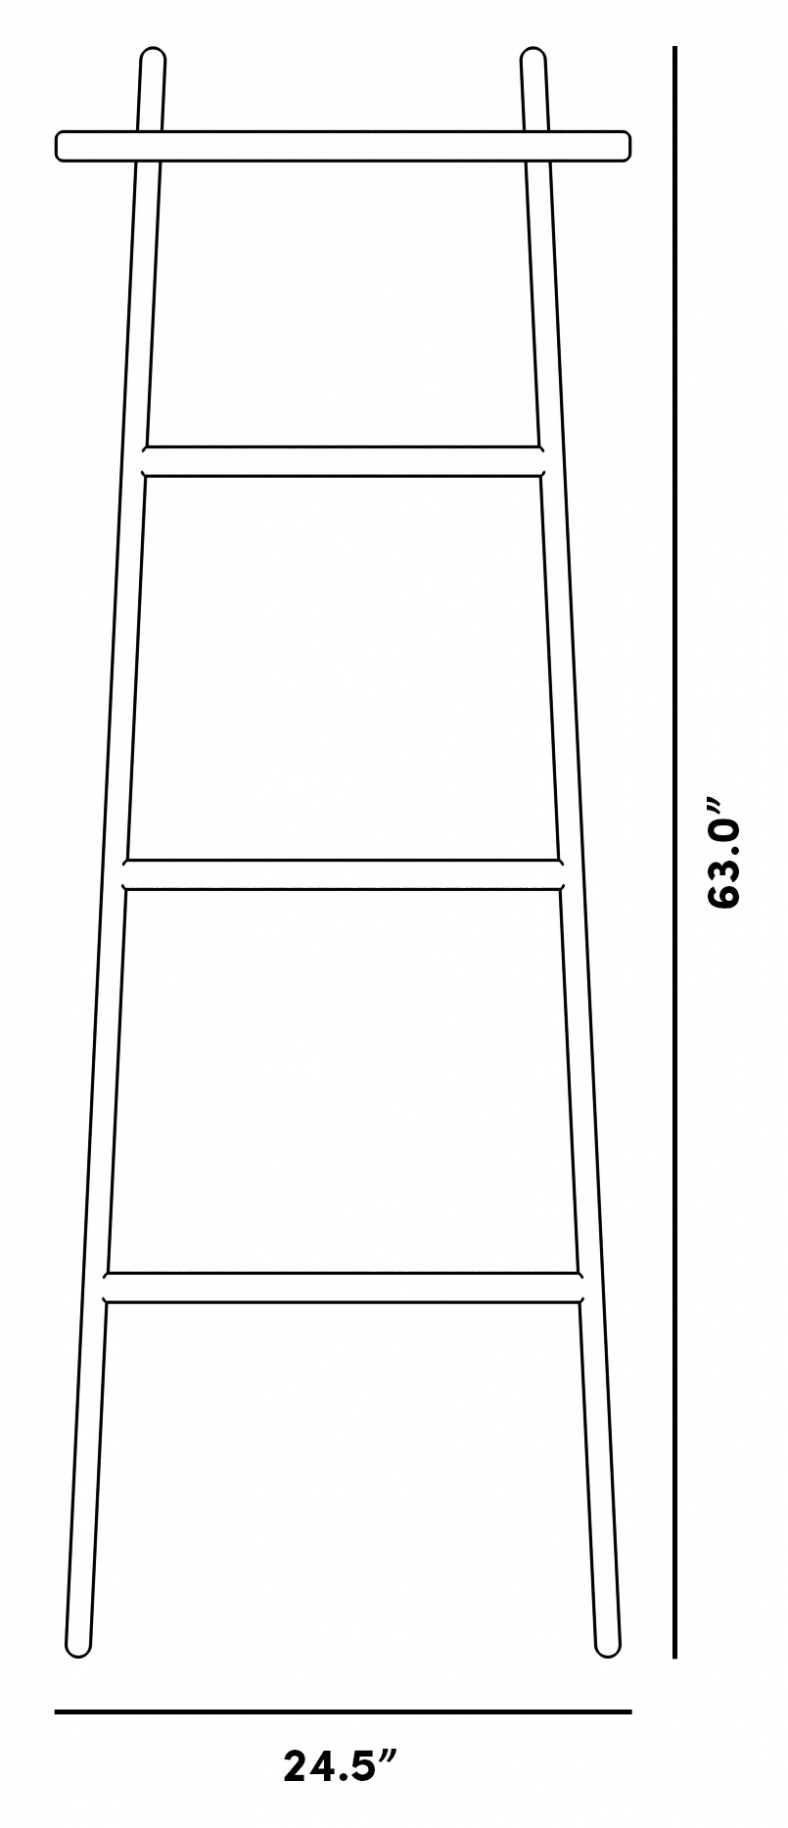 Dimensions for Jette Ladder Shelf